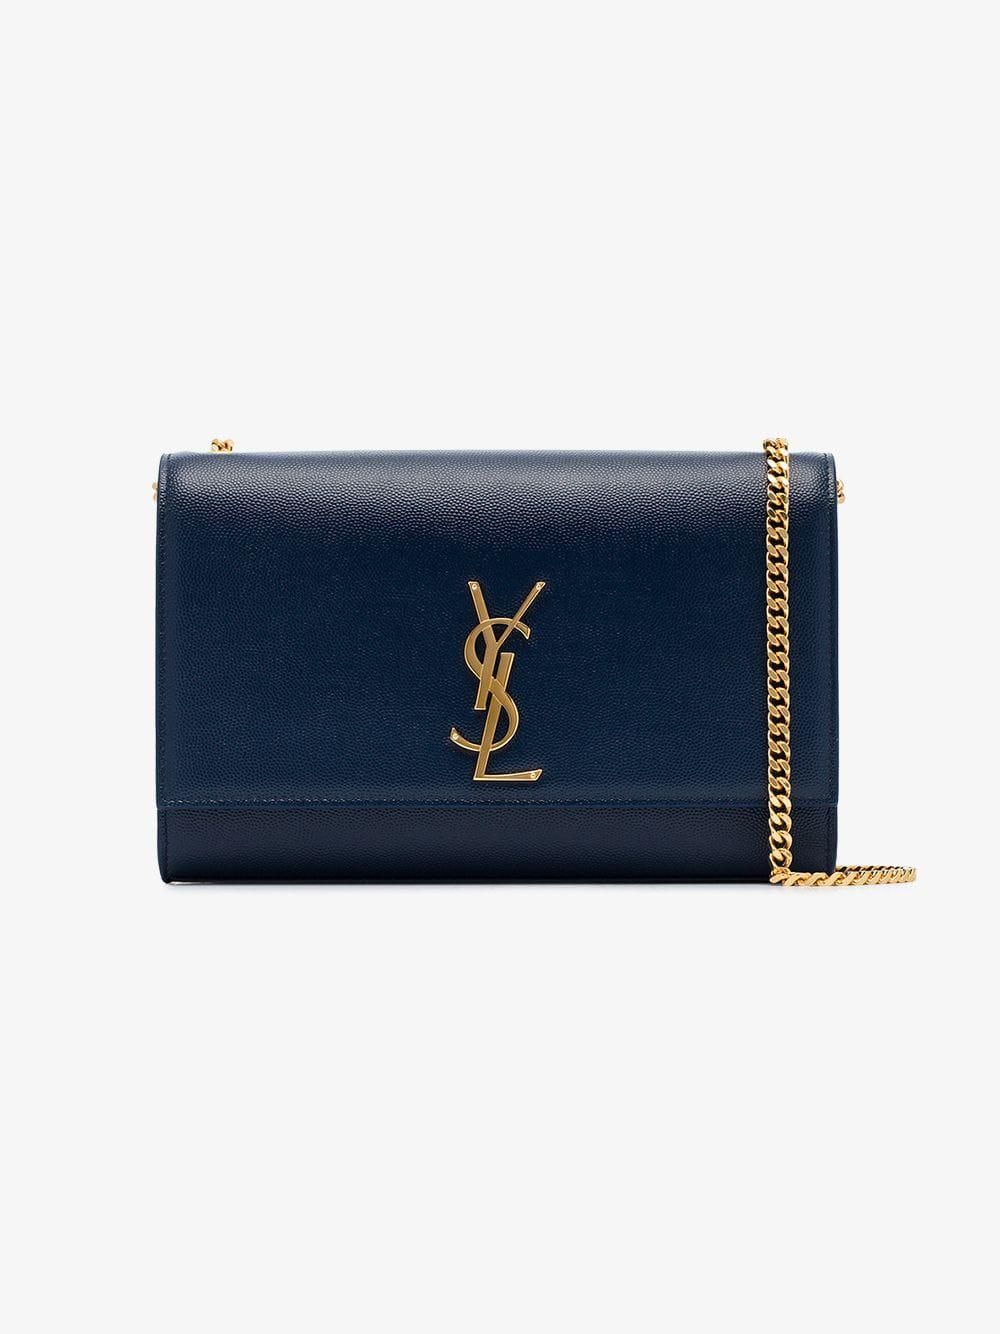 Lyst - Saint Laurent Midnight Blue Kate Grained Leather Shoulder Bag in Blue 36ffd63ba8528